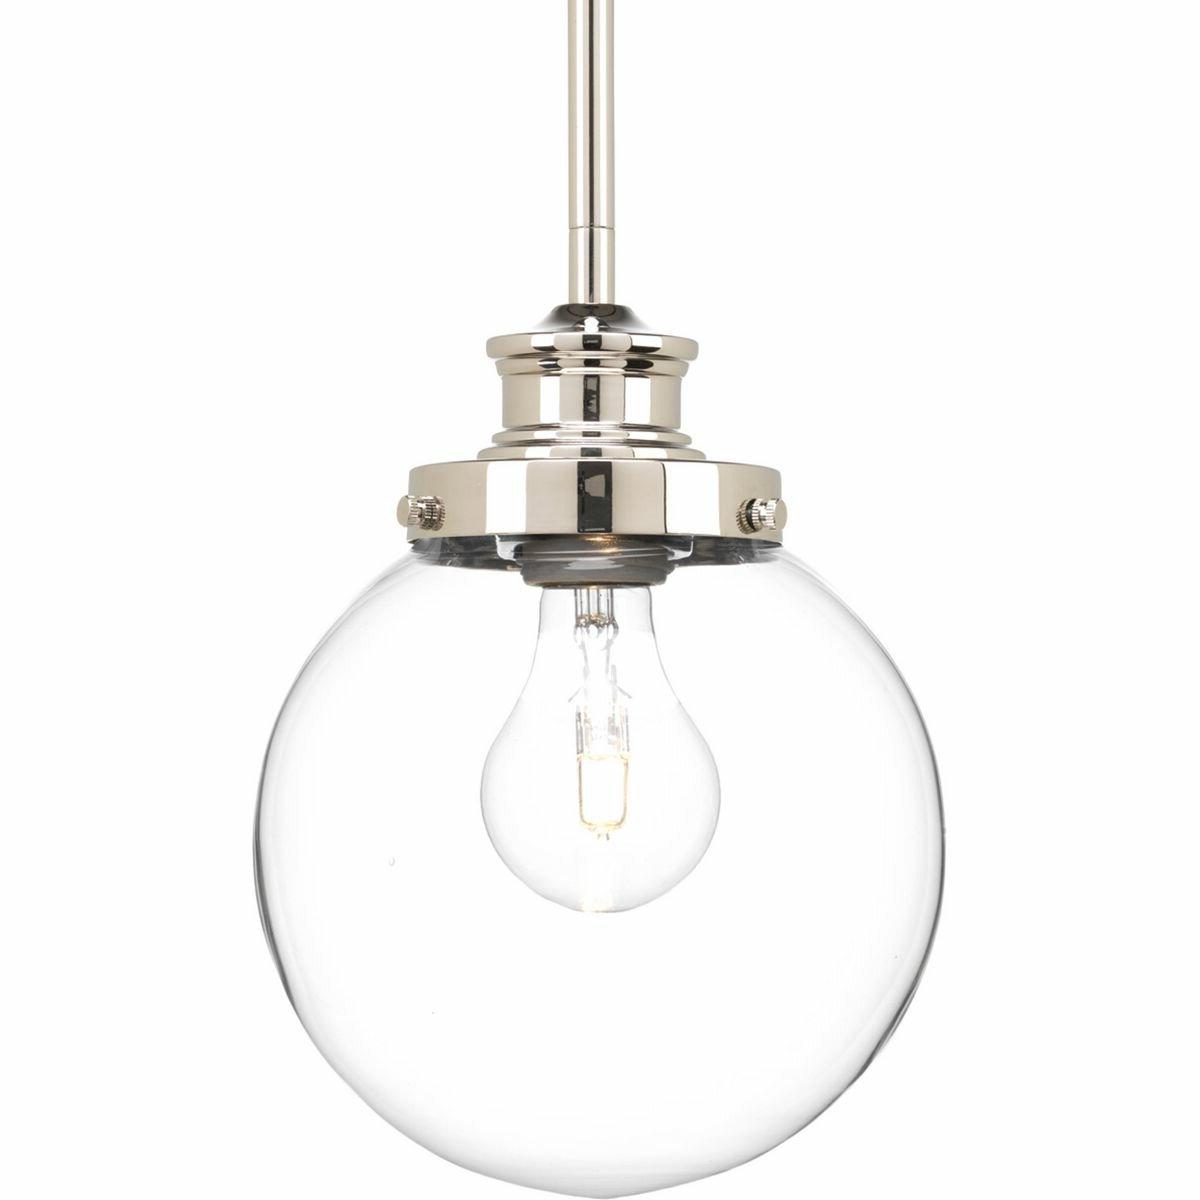 Cayden 1 Light Single Globe Pendant Throughout Well Known Betsy 1 Light Single Globe Pendants (View 6 of 20)